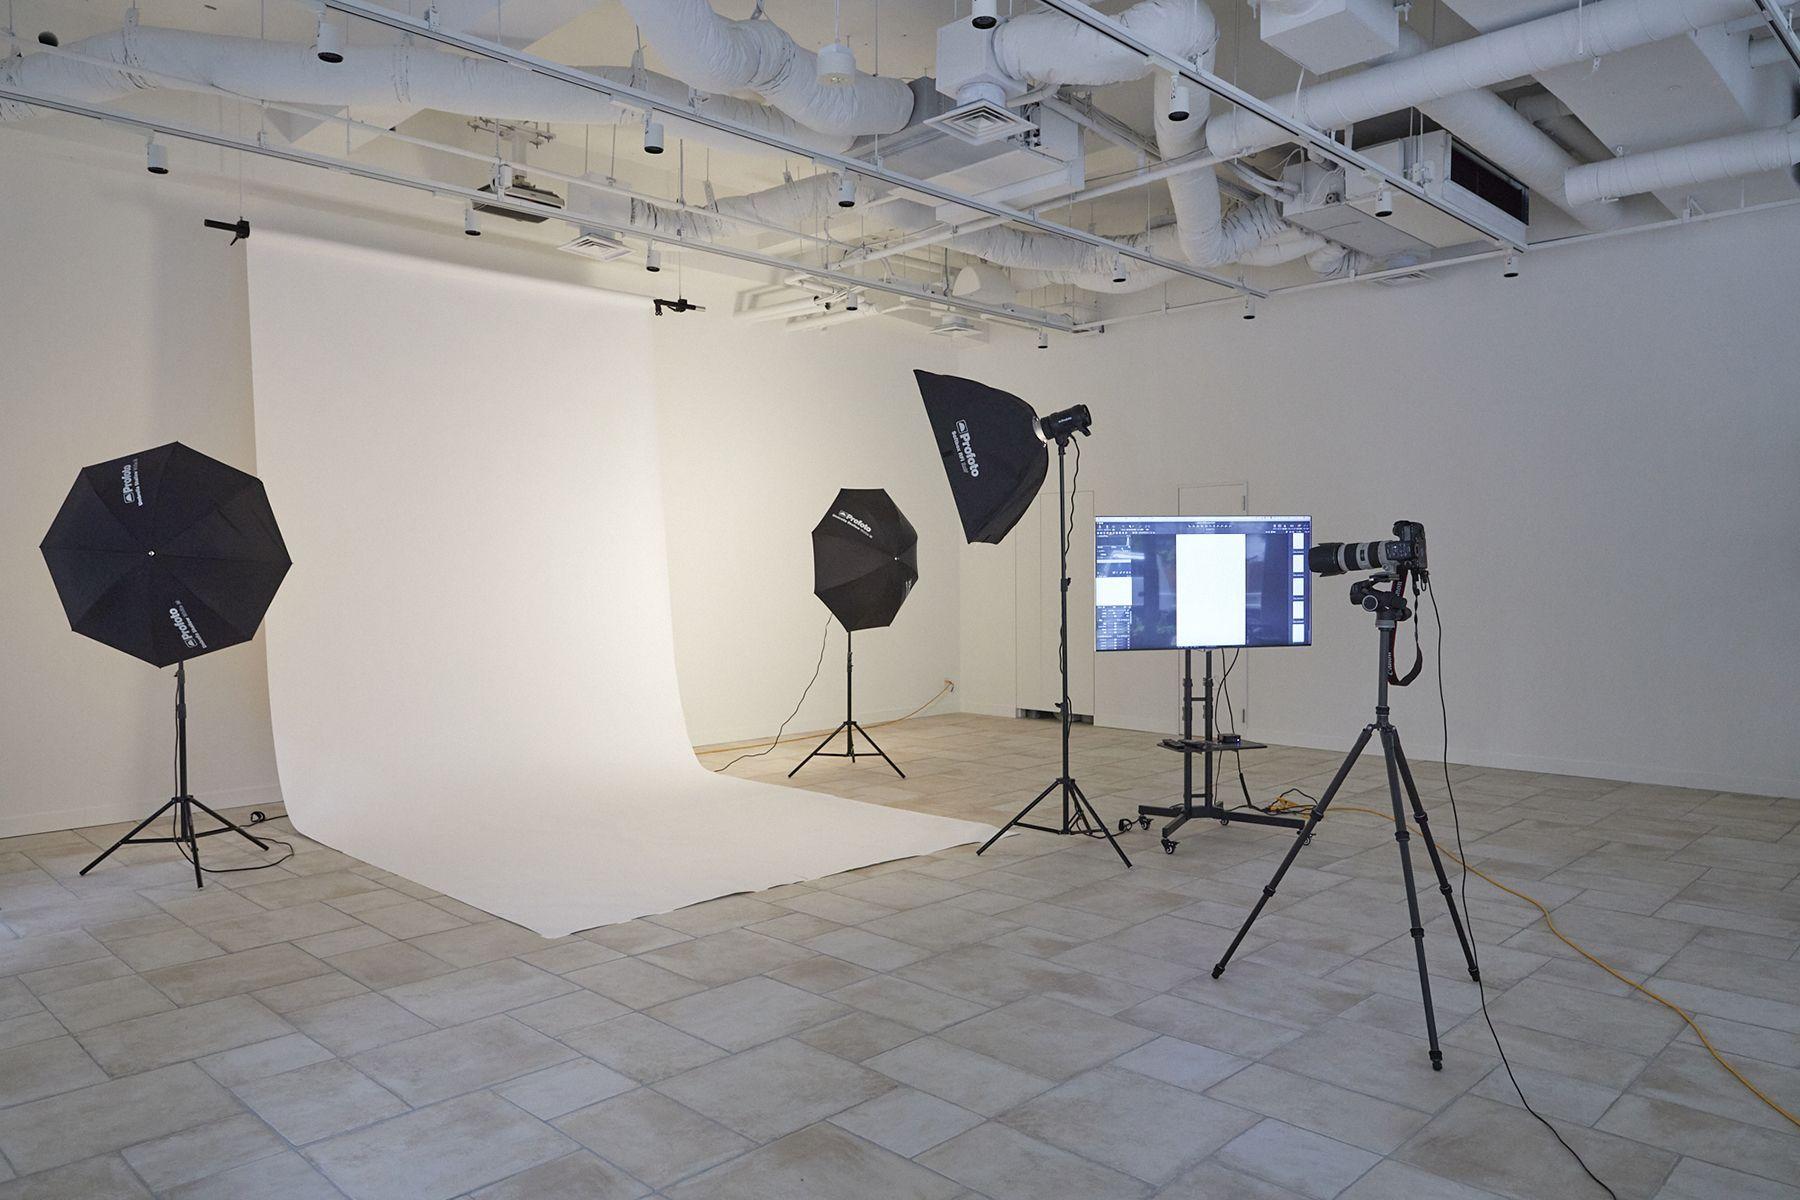 STUDIO DA VINCI C-studio (スタジオ ダヴィンチ シースタジオ)イベント利用も可能